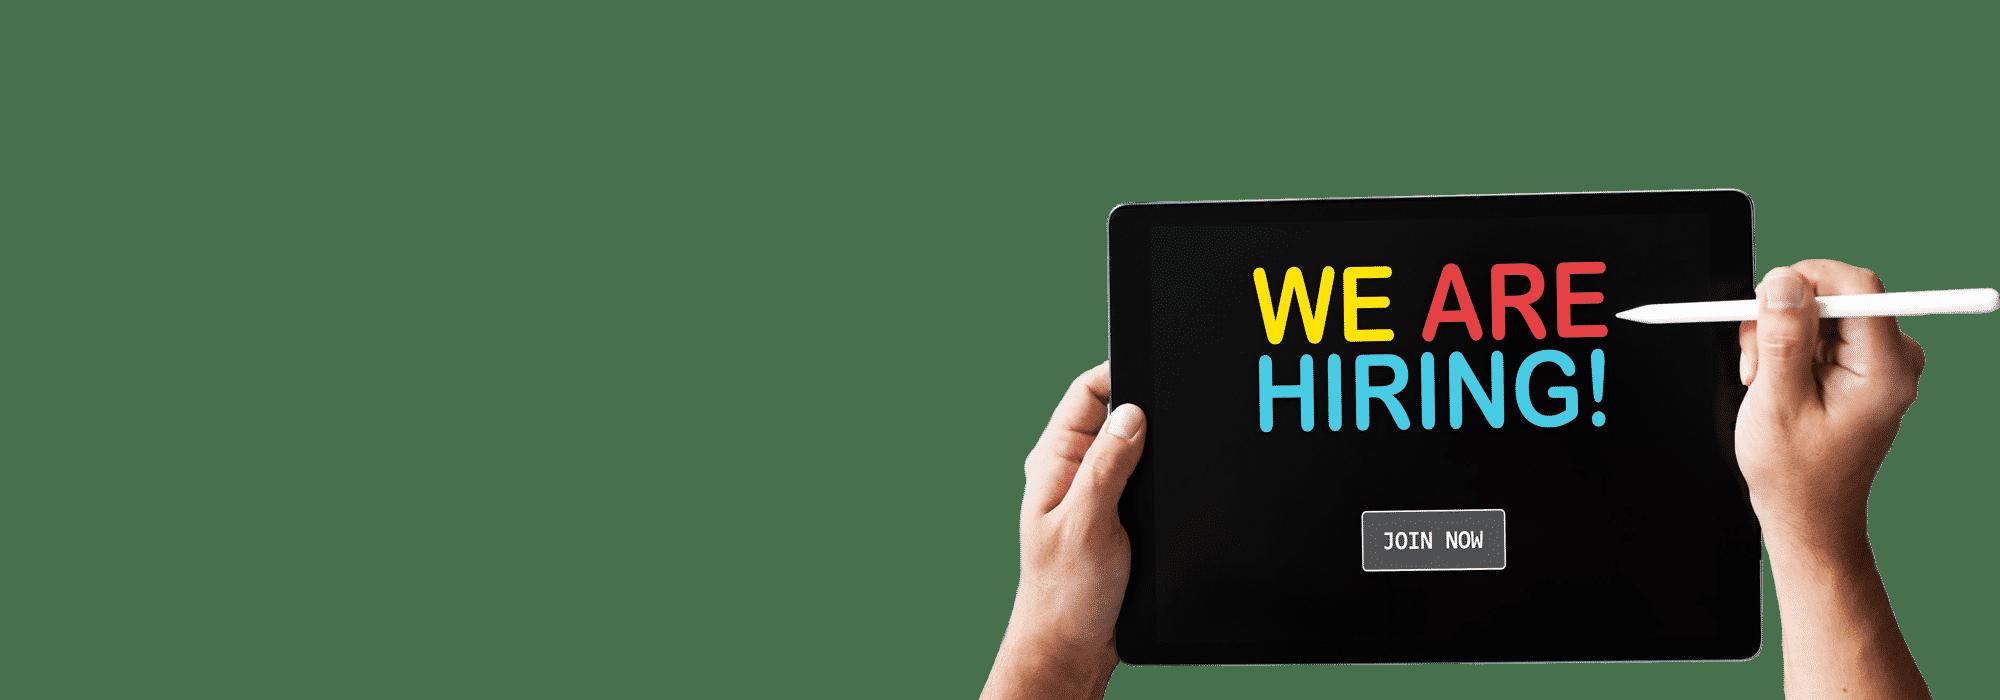 banner-job-seekers-resources